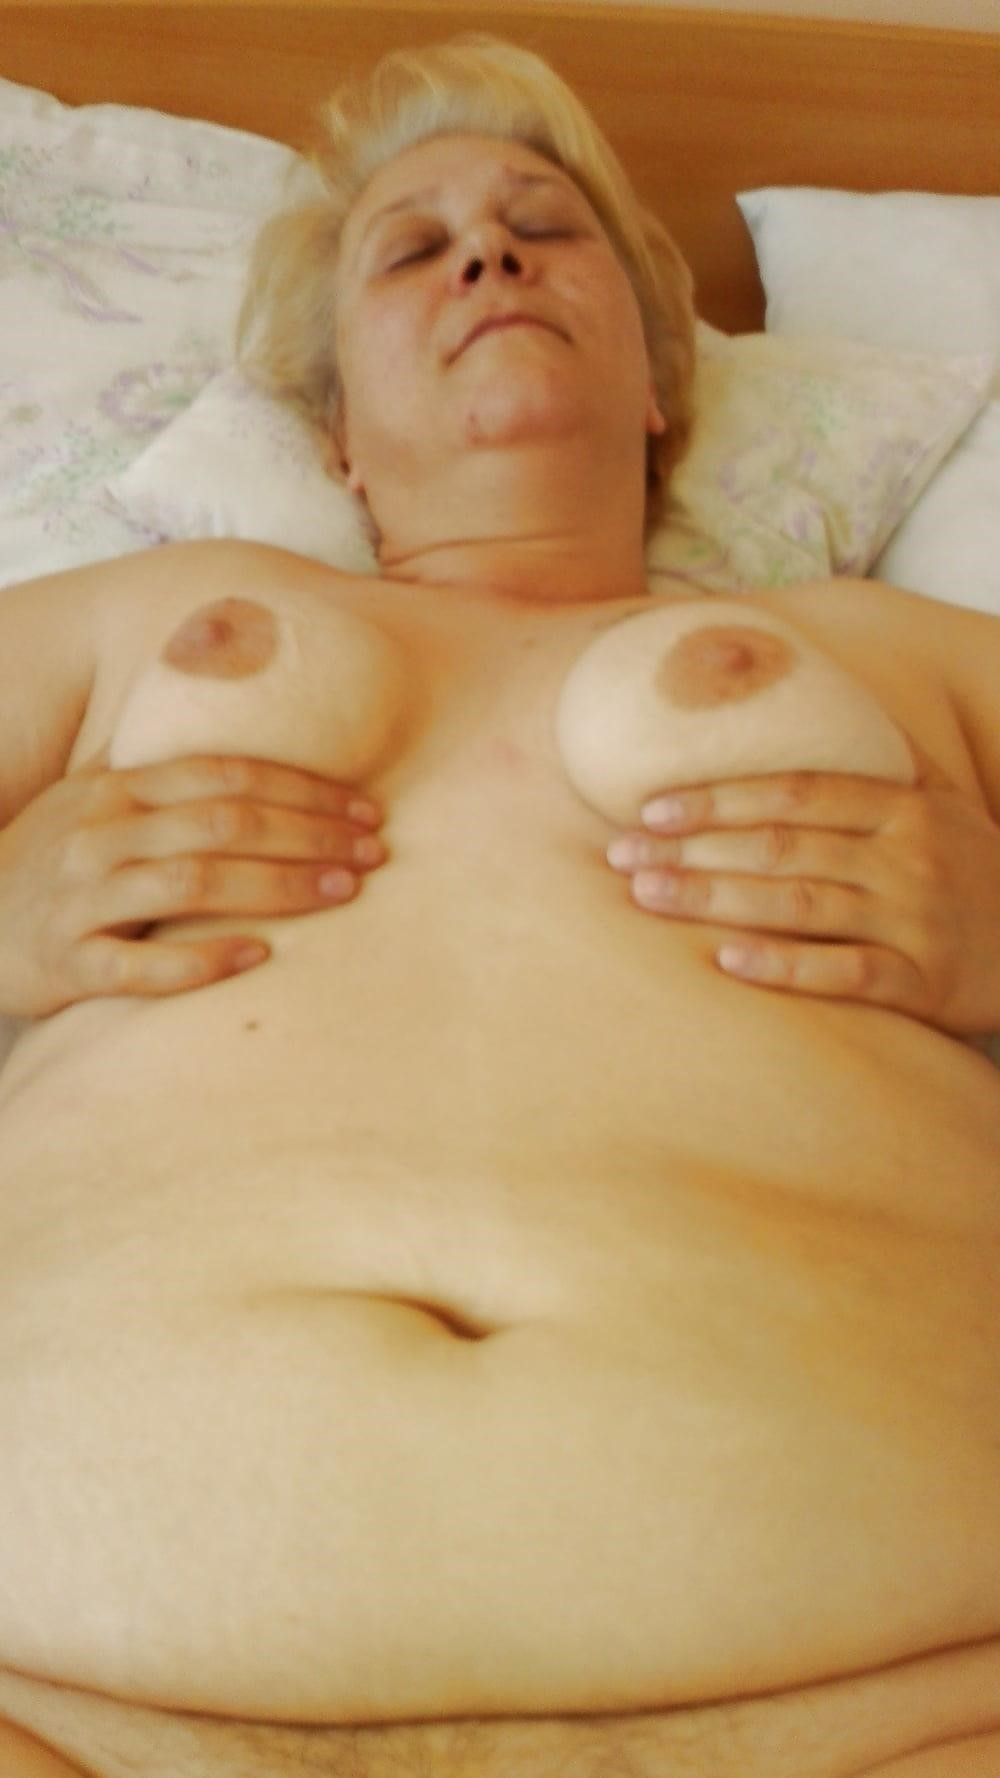 Big tits creampie pics-5850